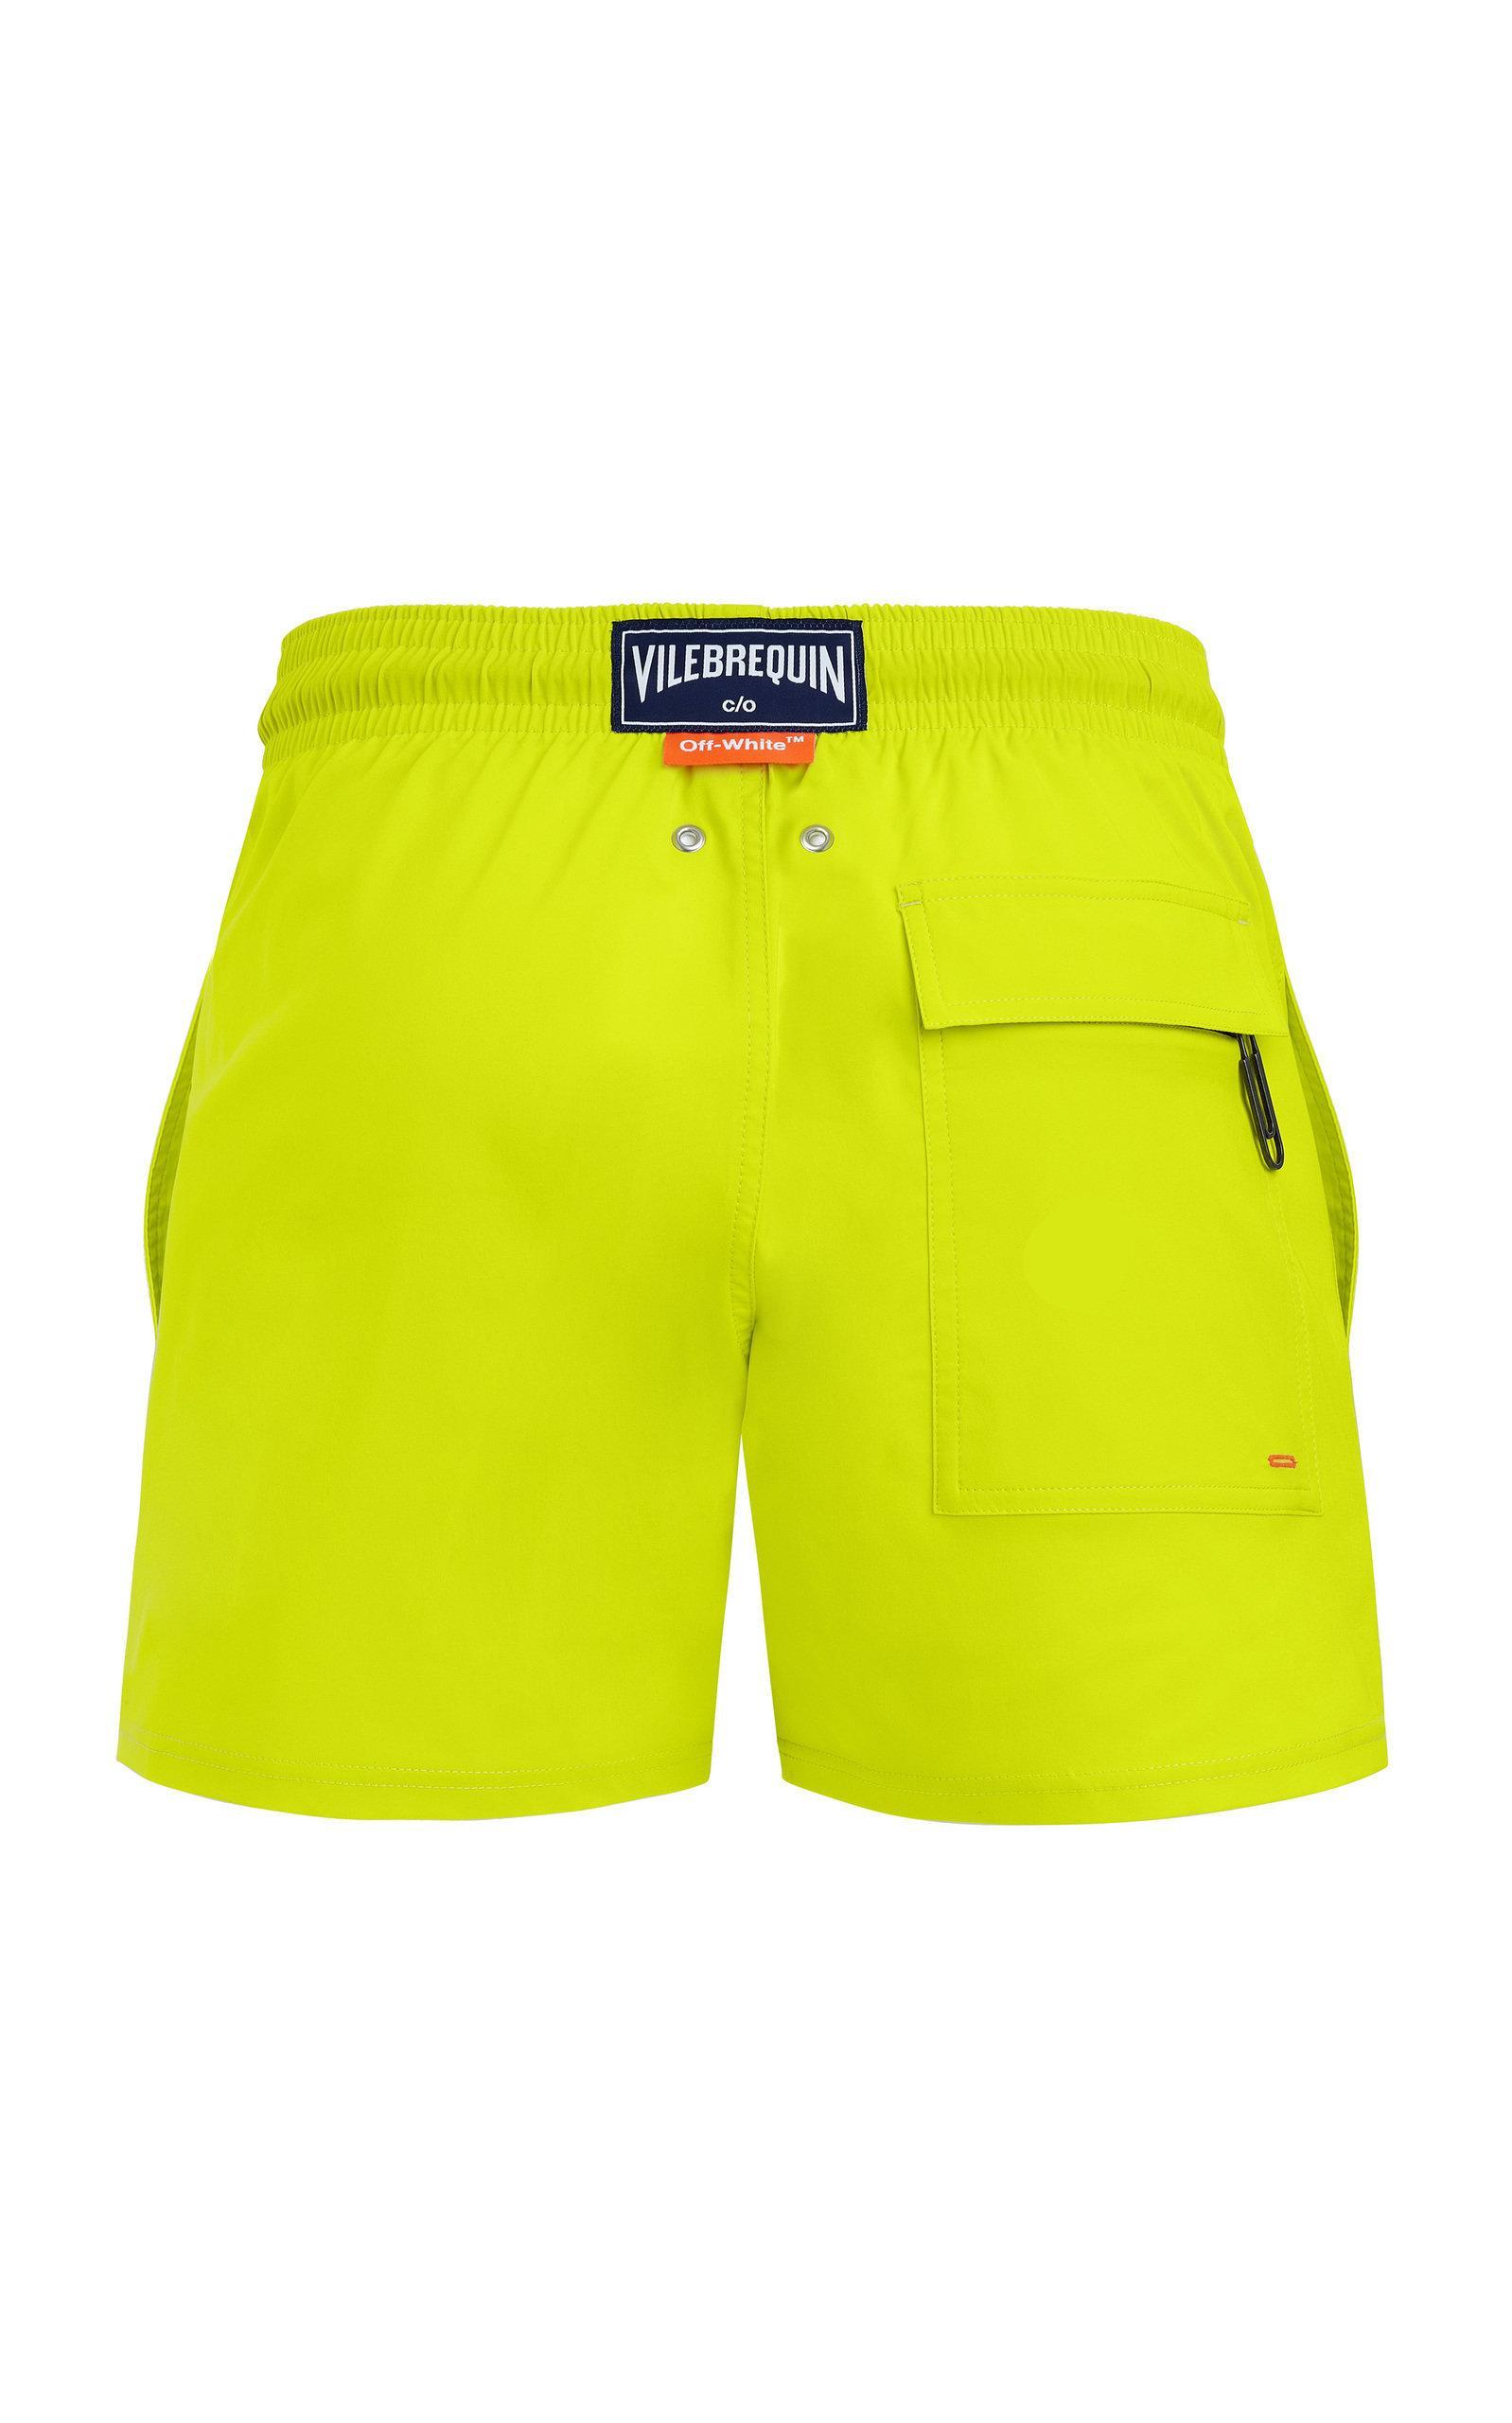 da2bf4ac61 Off-White c/o Virgil Abloh - Yellow Vilebrequin Edition Moorise Swim Shorts  for. View fullscreen